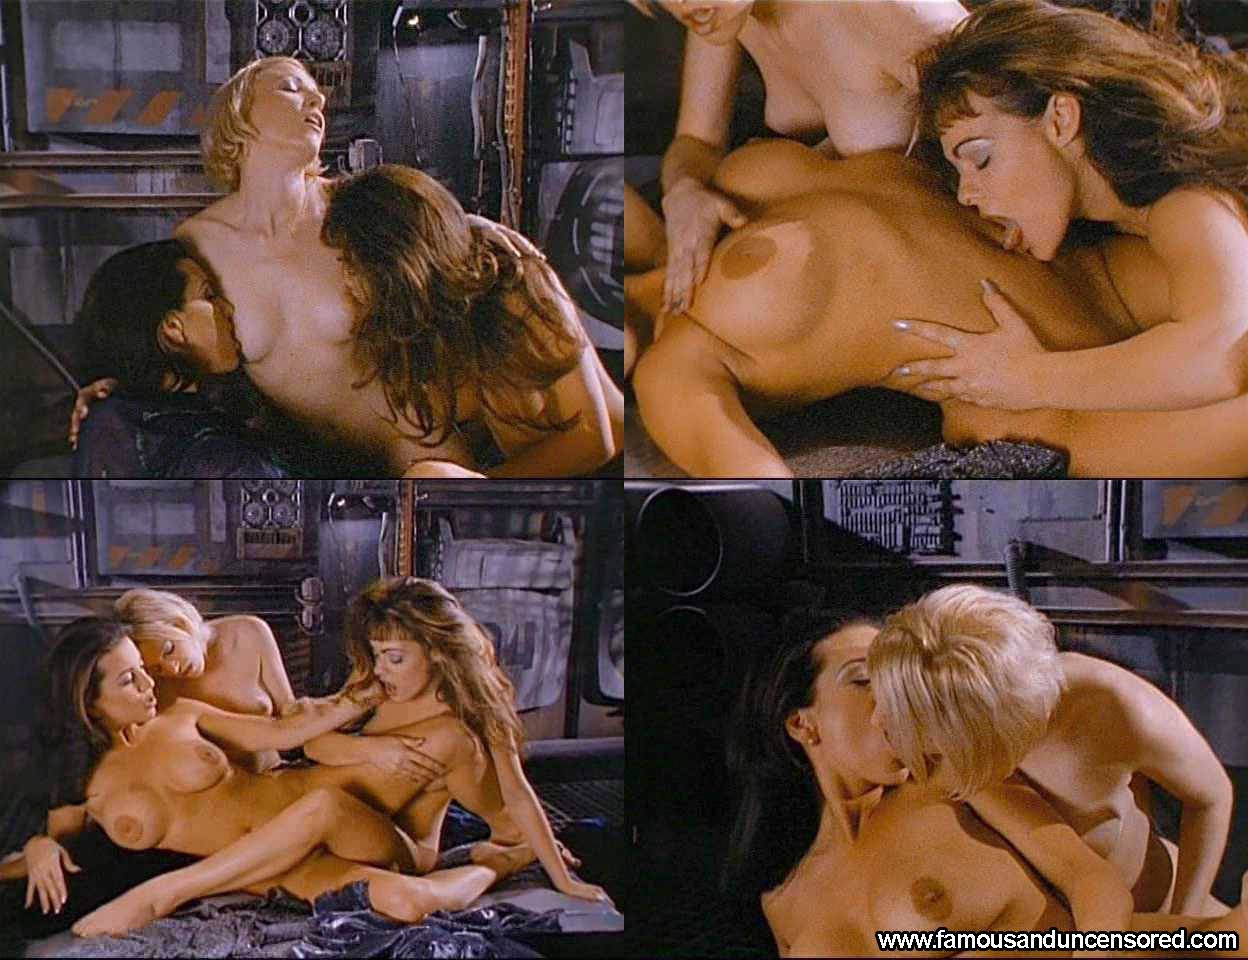 Brandy davis porn video best porno